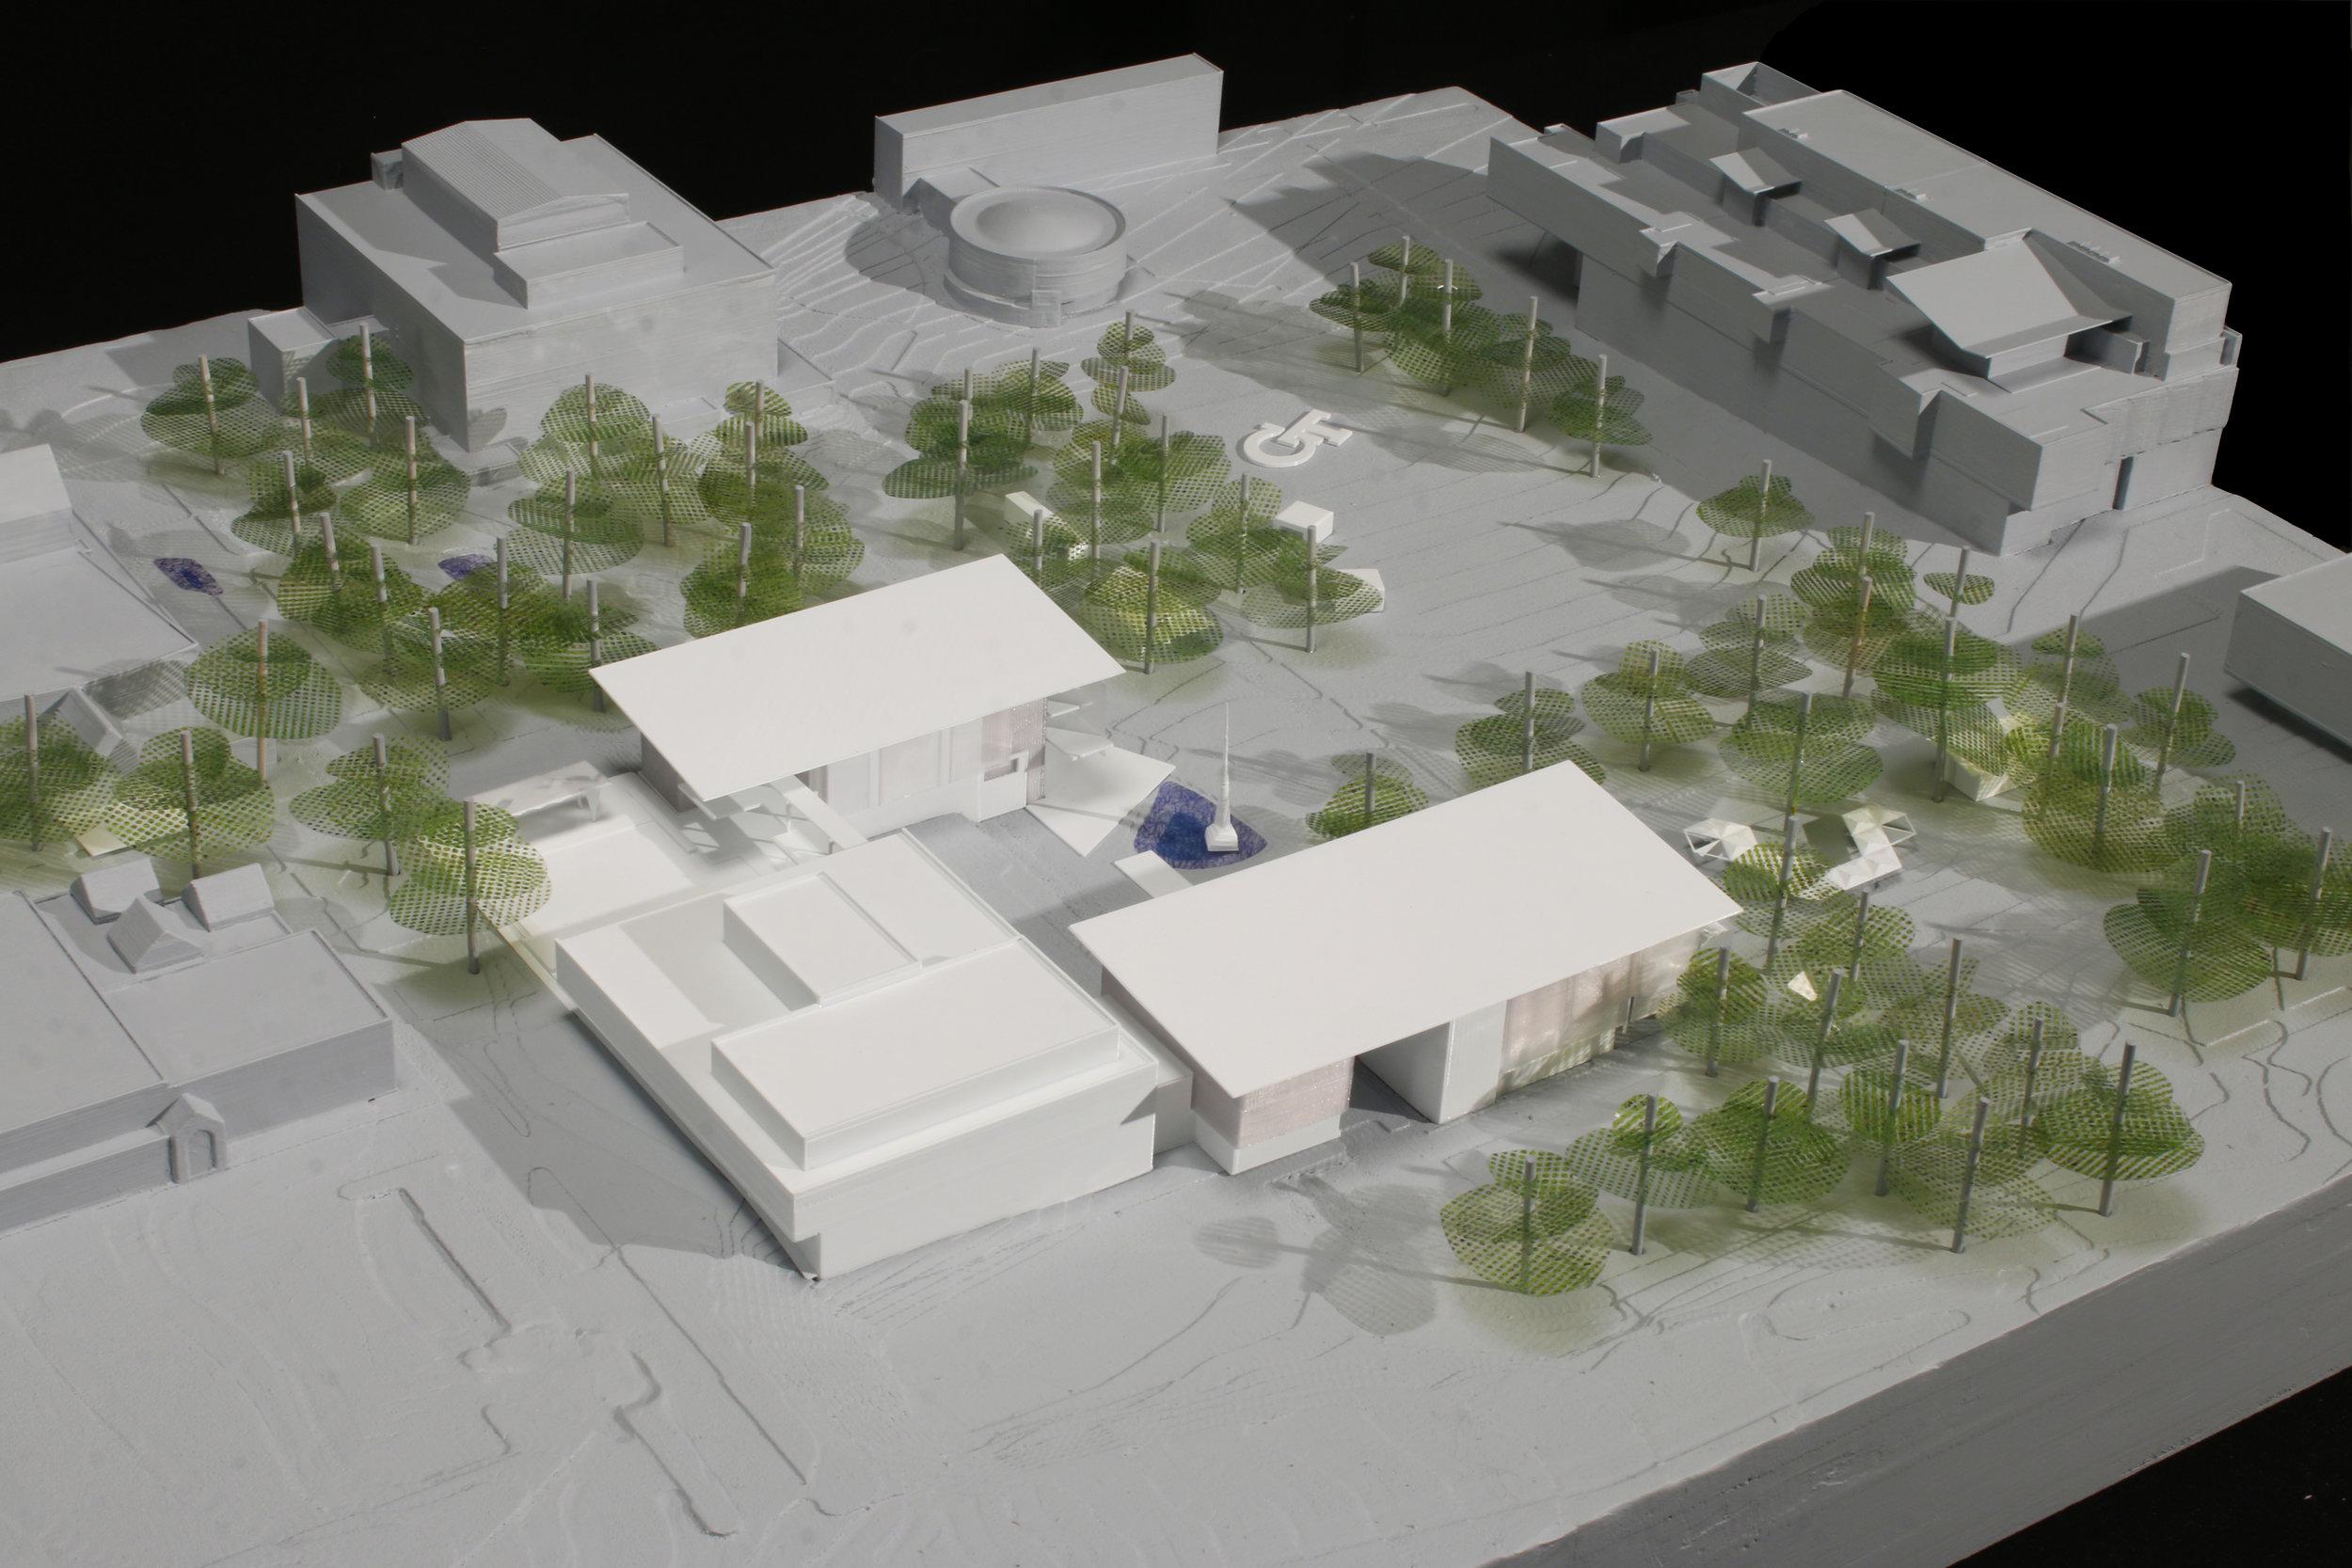 Workshop Wins Georgia Tech Campus Center Ideas Competition